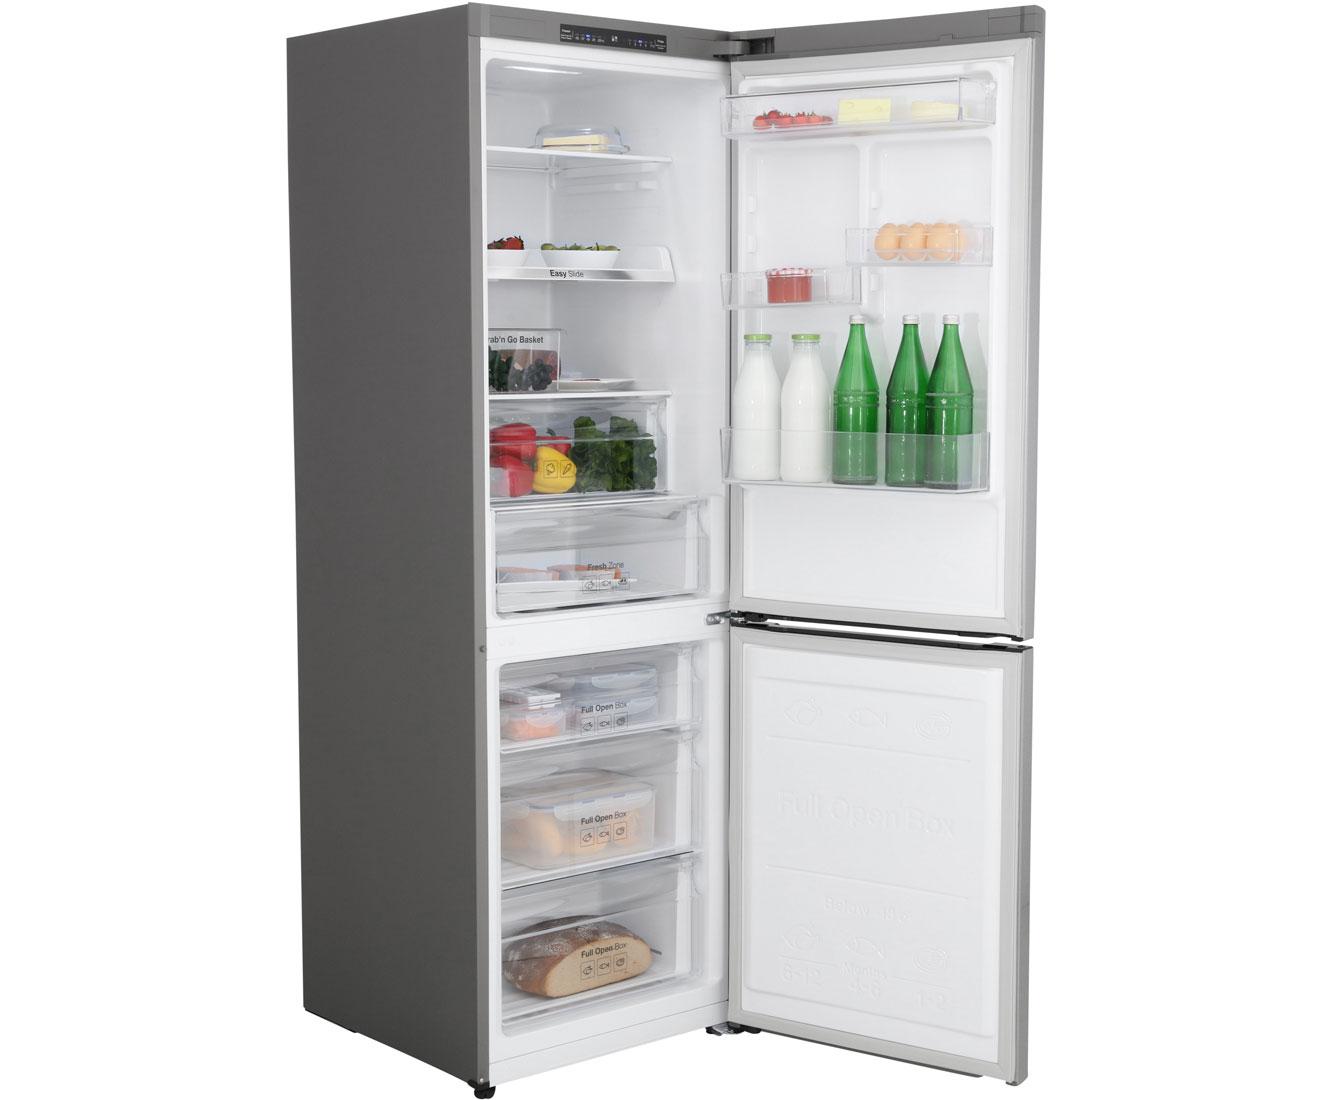 Kühlschrank Samsung : Samsung rf j sr side by side kühlschrank edelstahl in